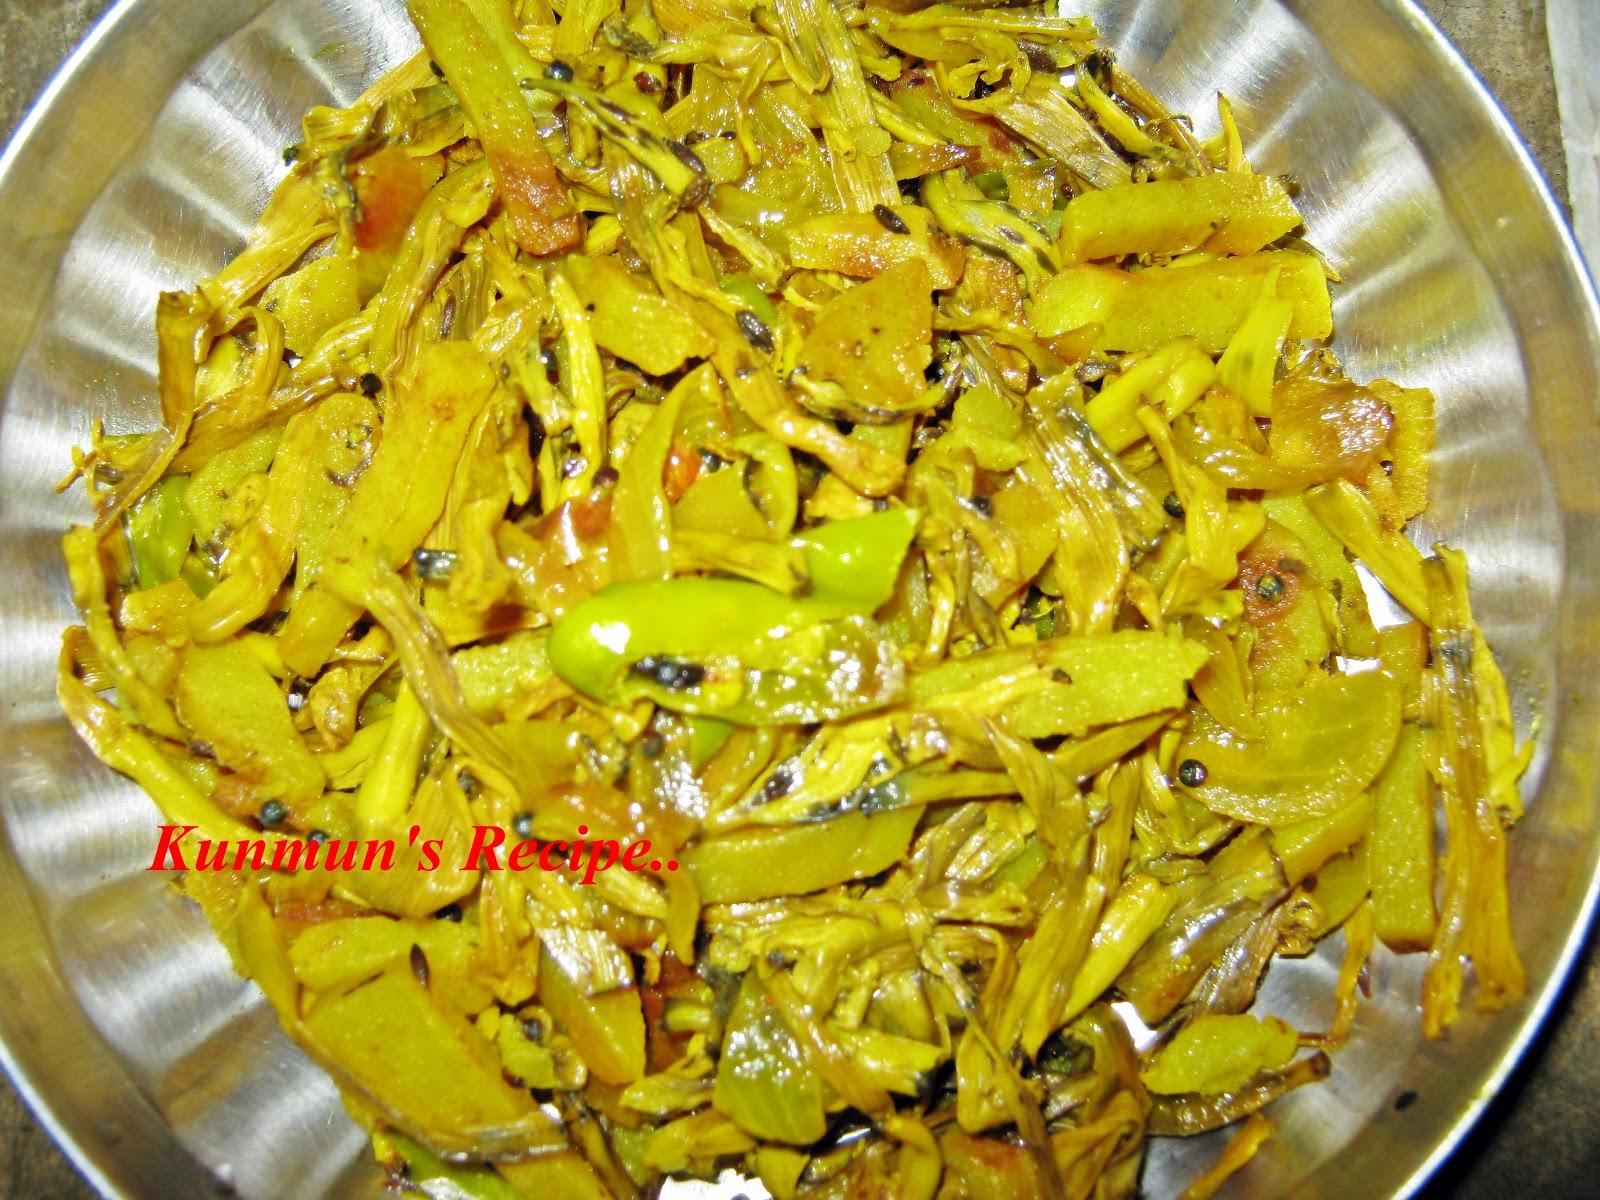 Kunmun s Delicious Kitchen BANANA BLOSSOM KADALI BHANDA RECIPE